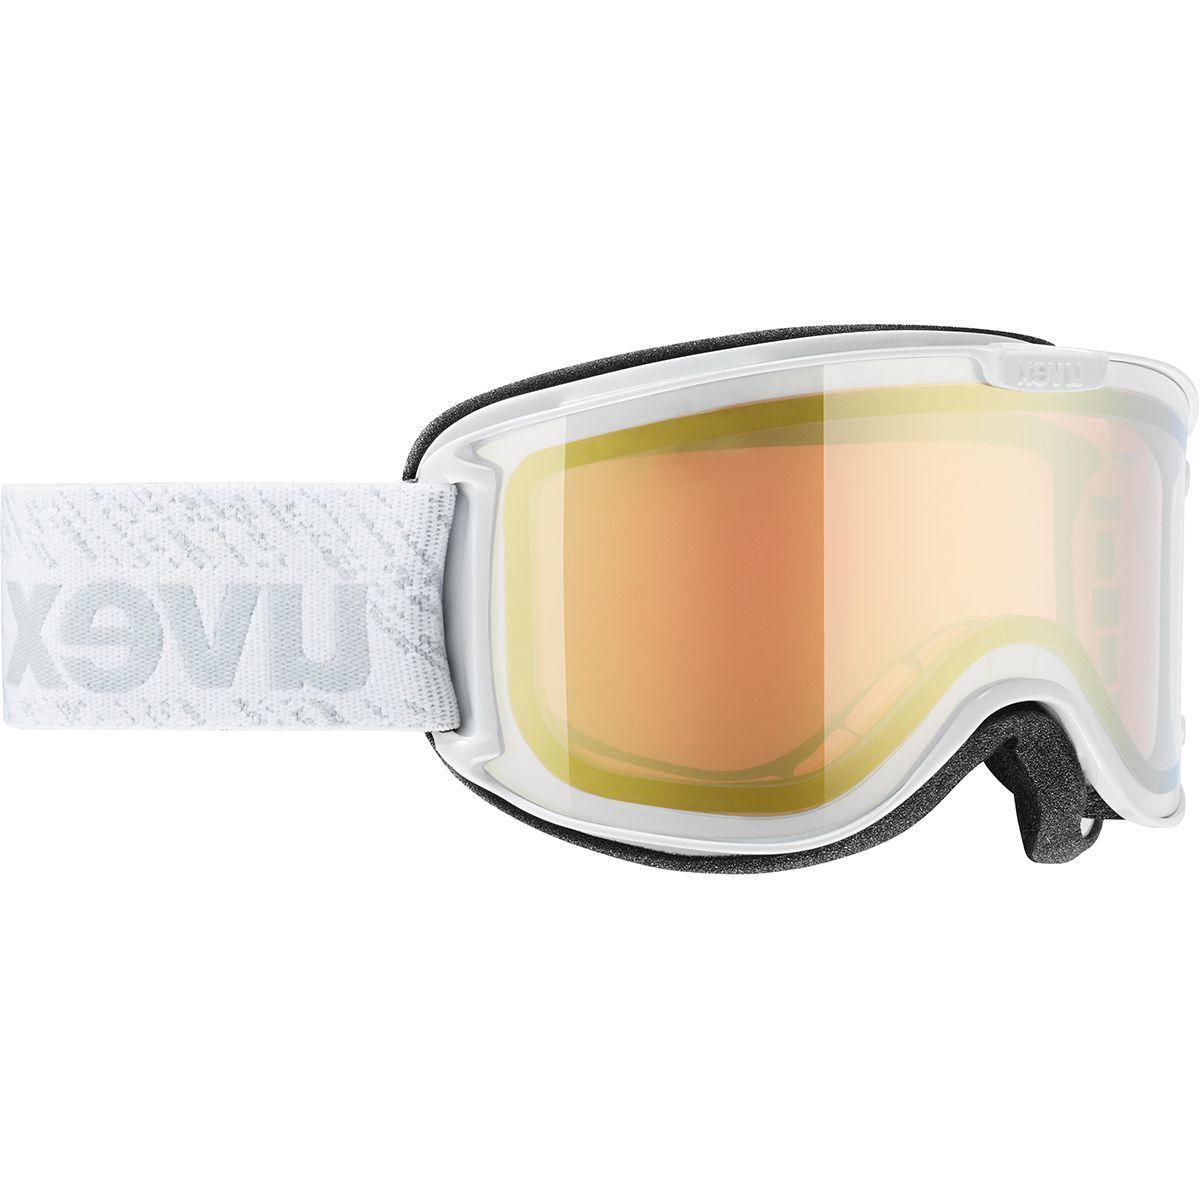 Uvex Skyper LM Goggles - Women's